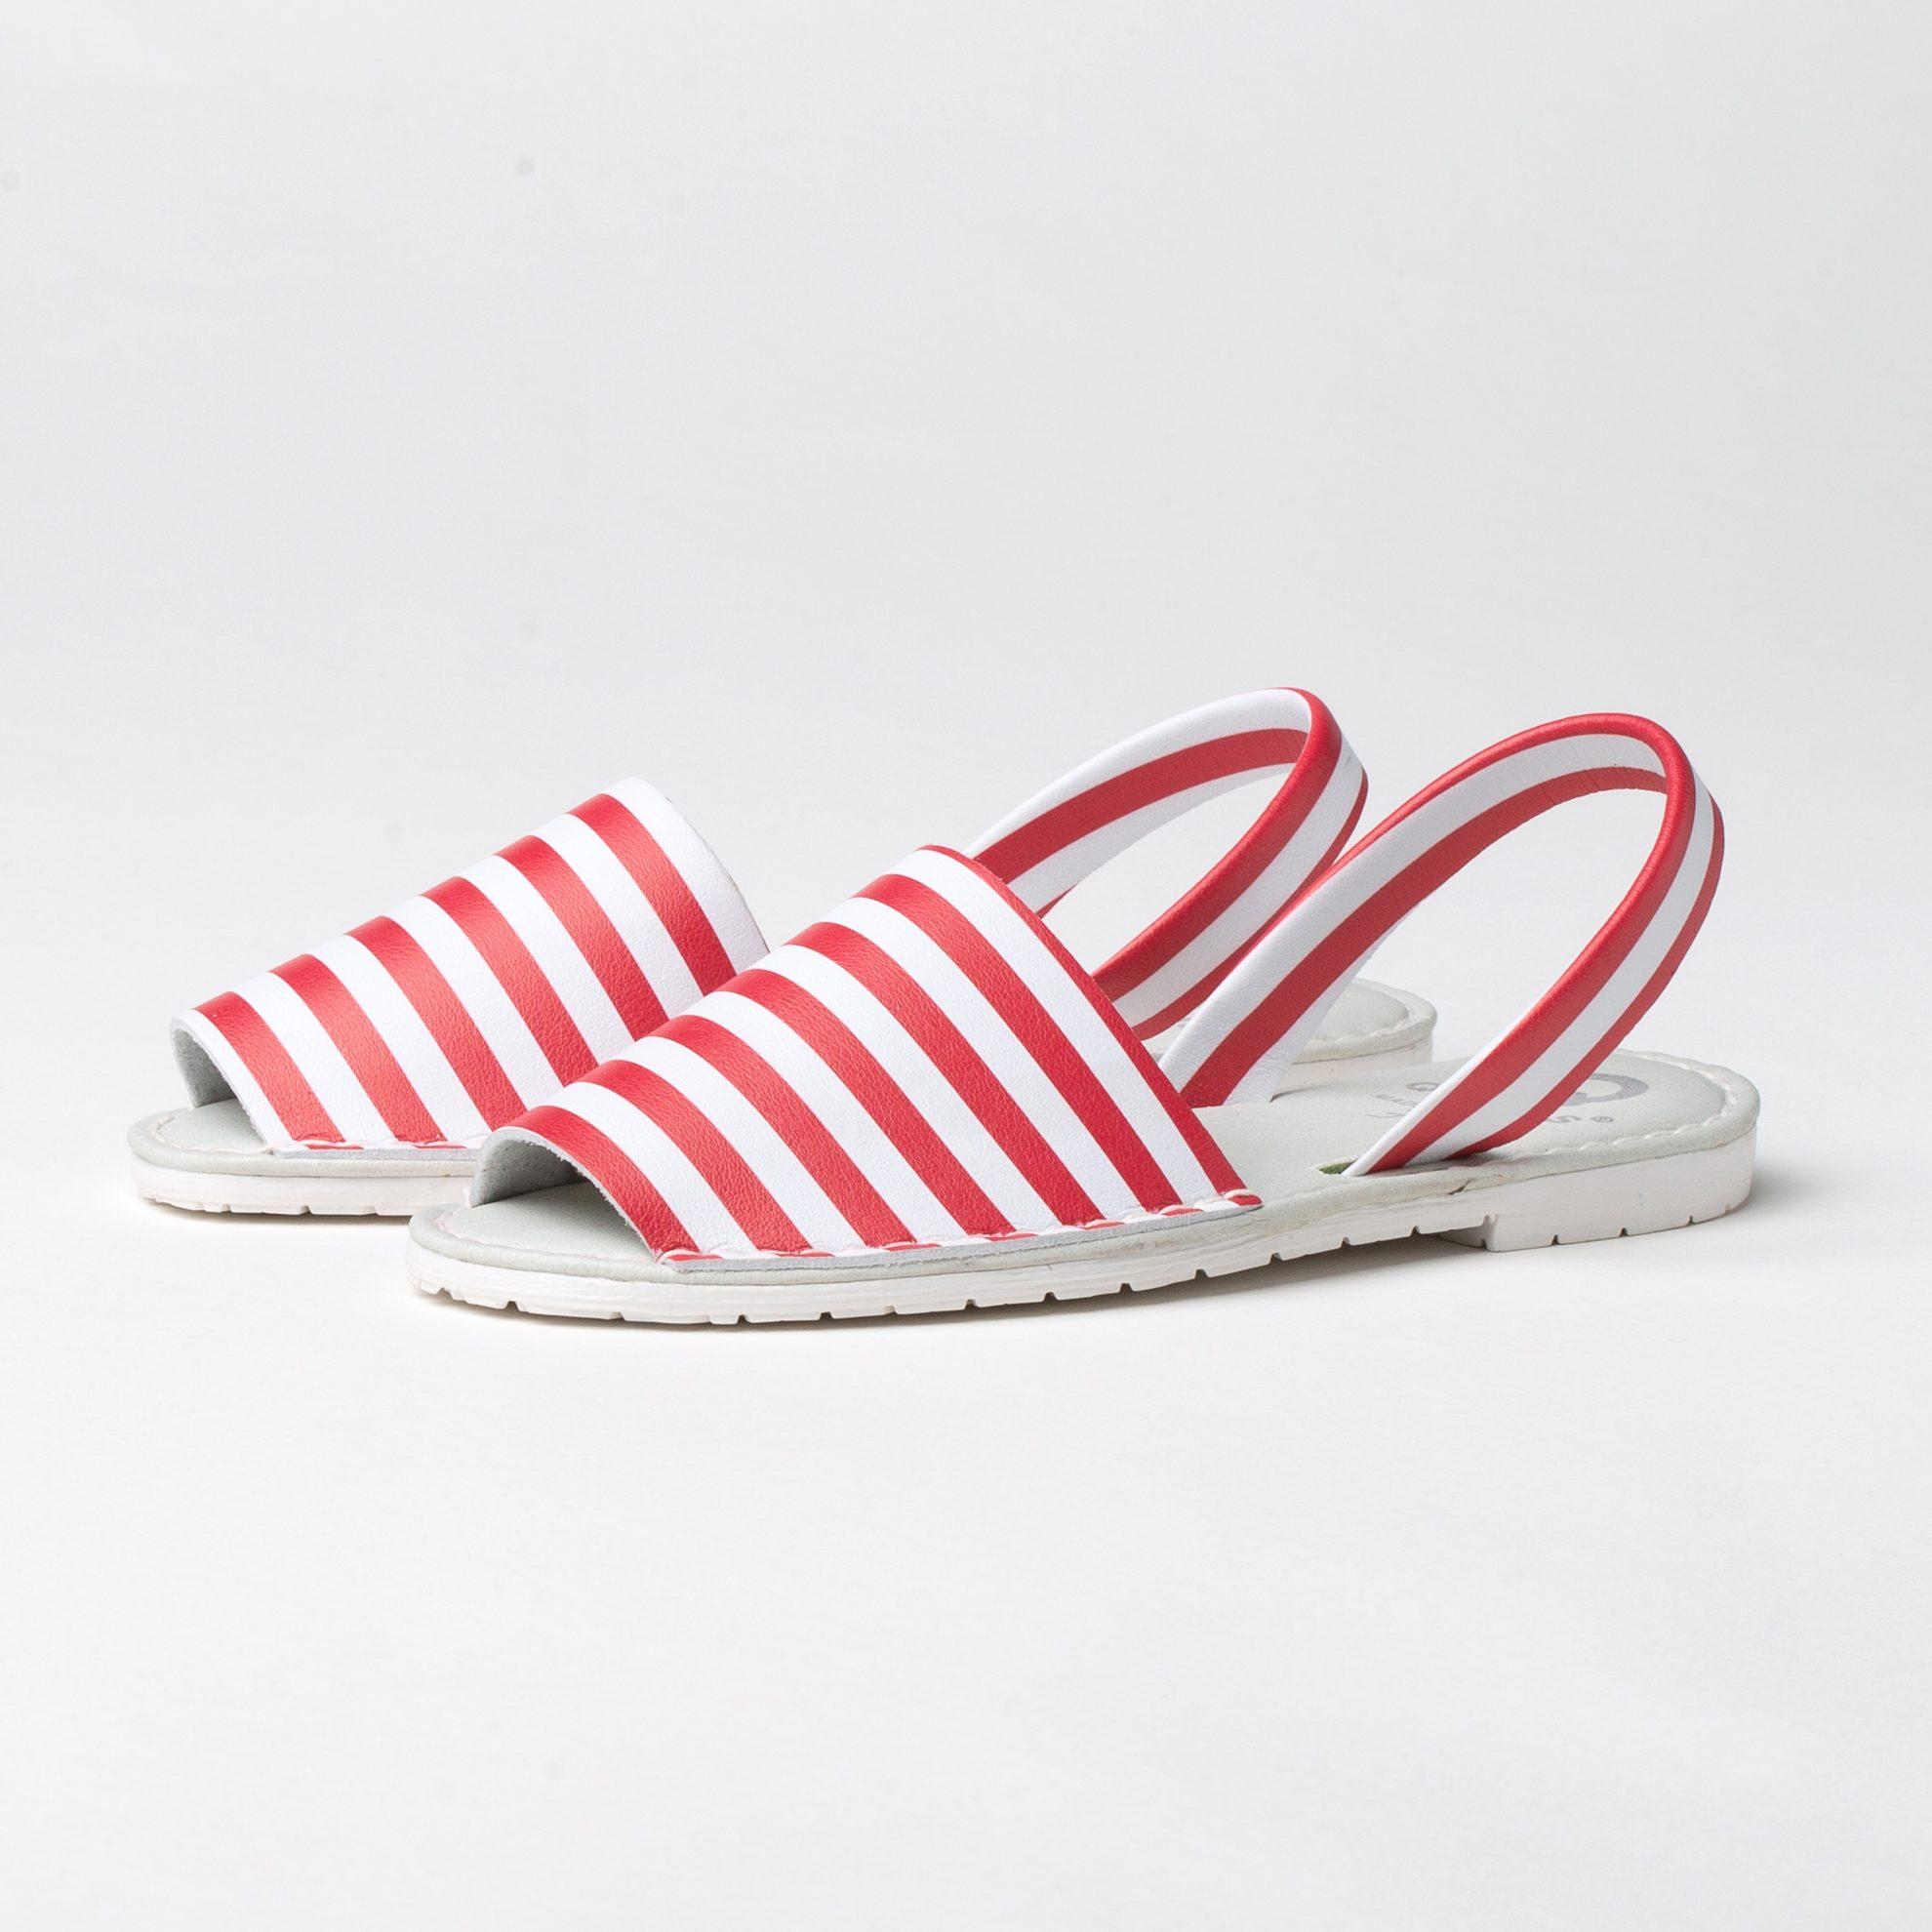 Menorquina Mujer Marsella Color Rojo   Sandalias de mujer Talla 36-41  zapatos planos mujer sandalia verano